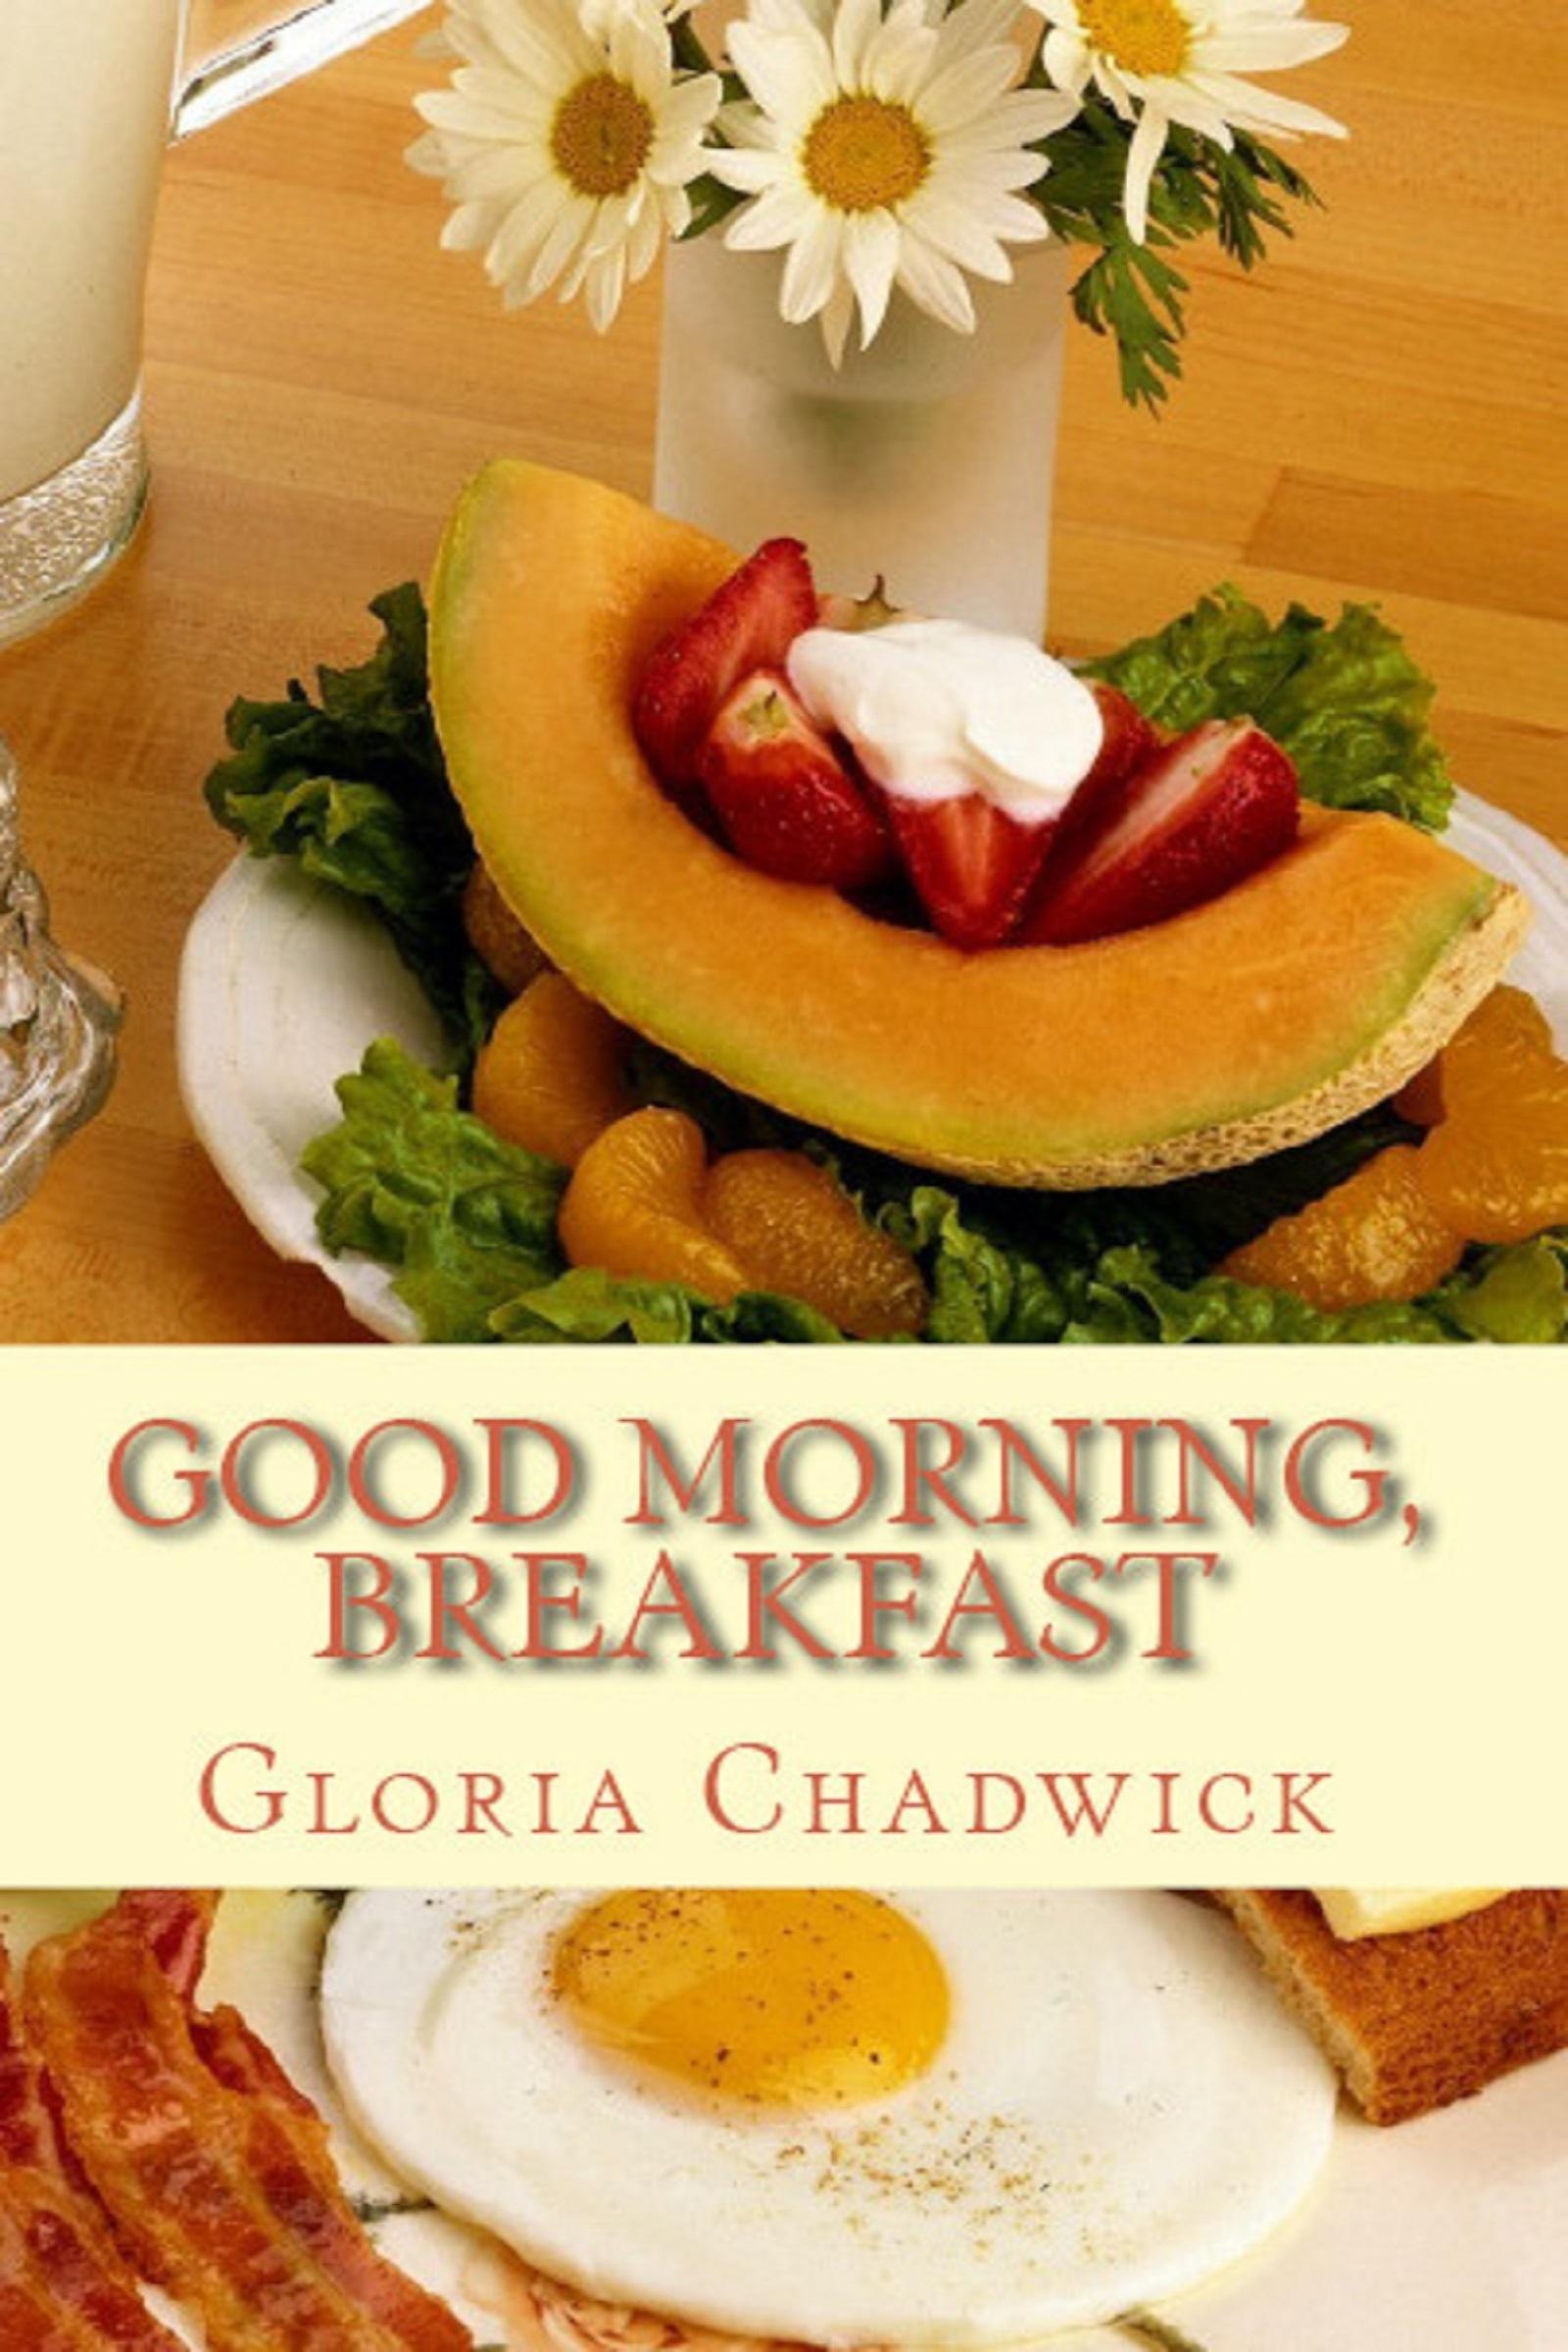 Good Morning, Breakfast  by  Gloria Chadwick